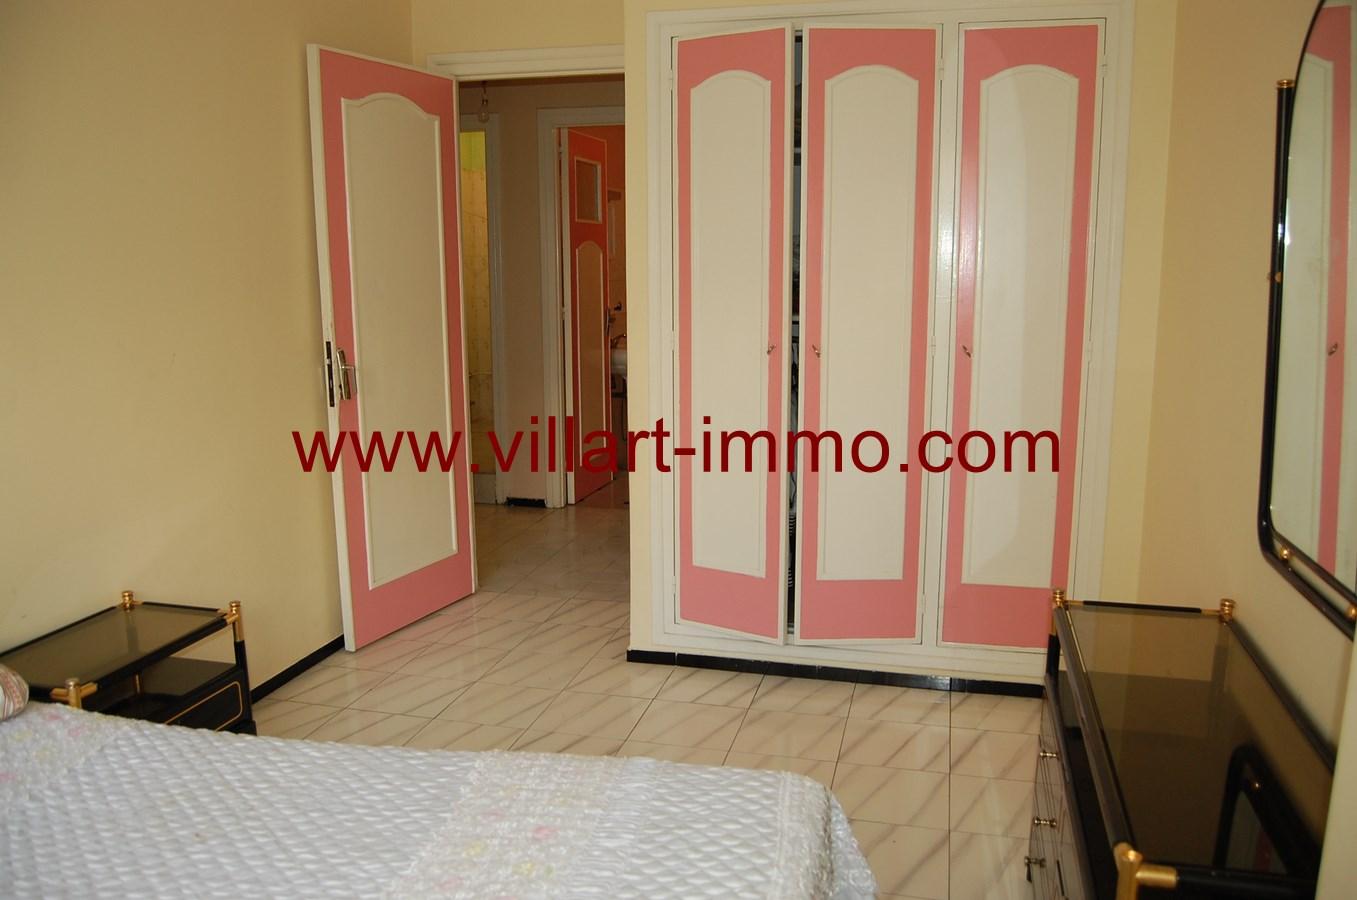 4-vente-appartement-tanger-centre-ville-chambre-2-va457-villart-immo